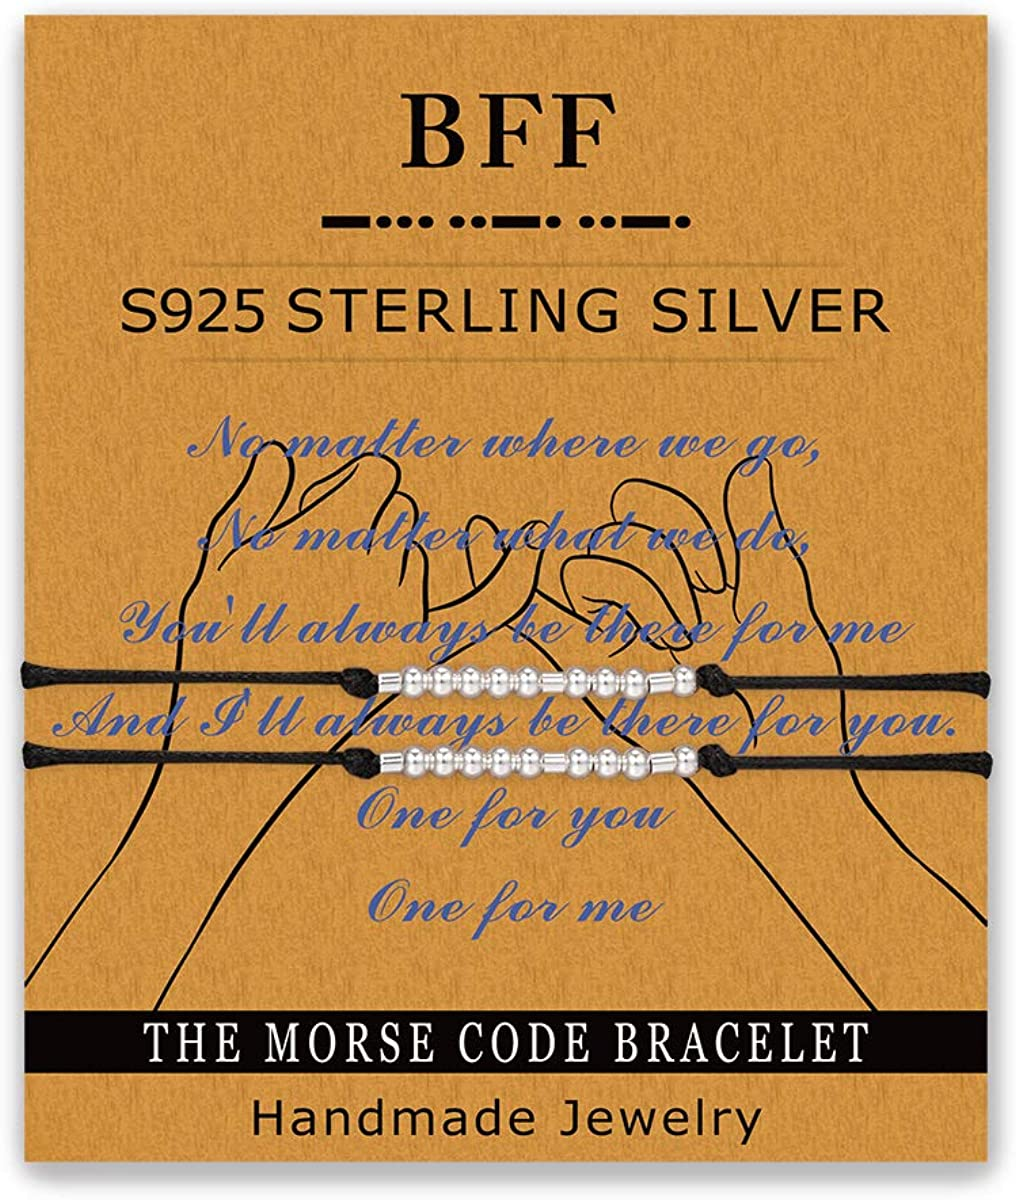 Glimkis Morse Code Bracelets Handmade S925 Sterling Silver Adjustable String Bracelets Friendship Bracelet